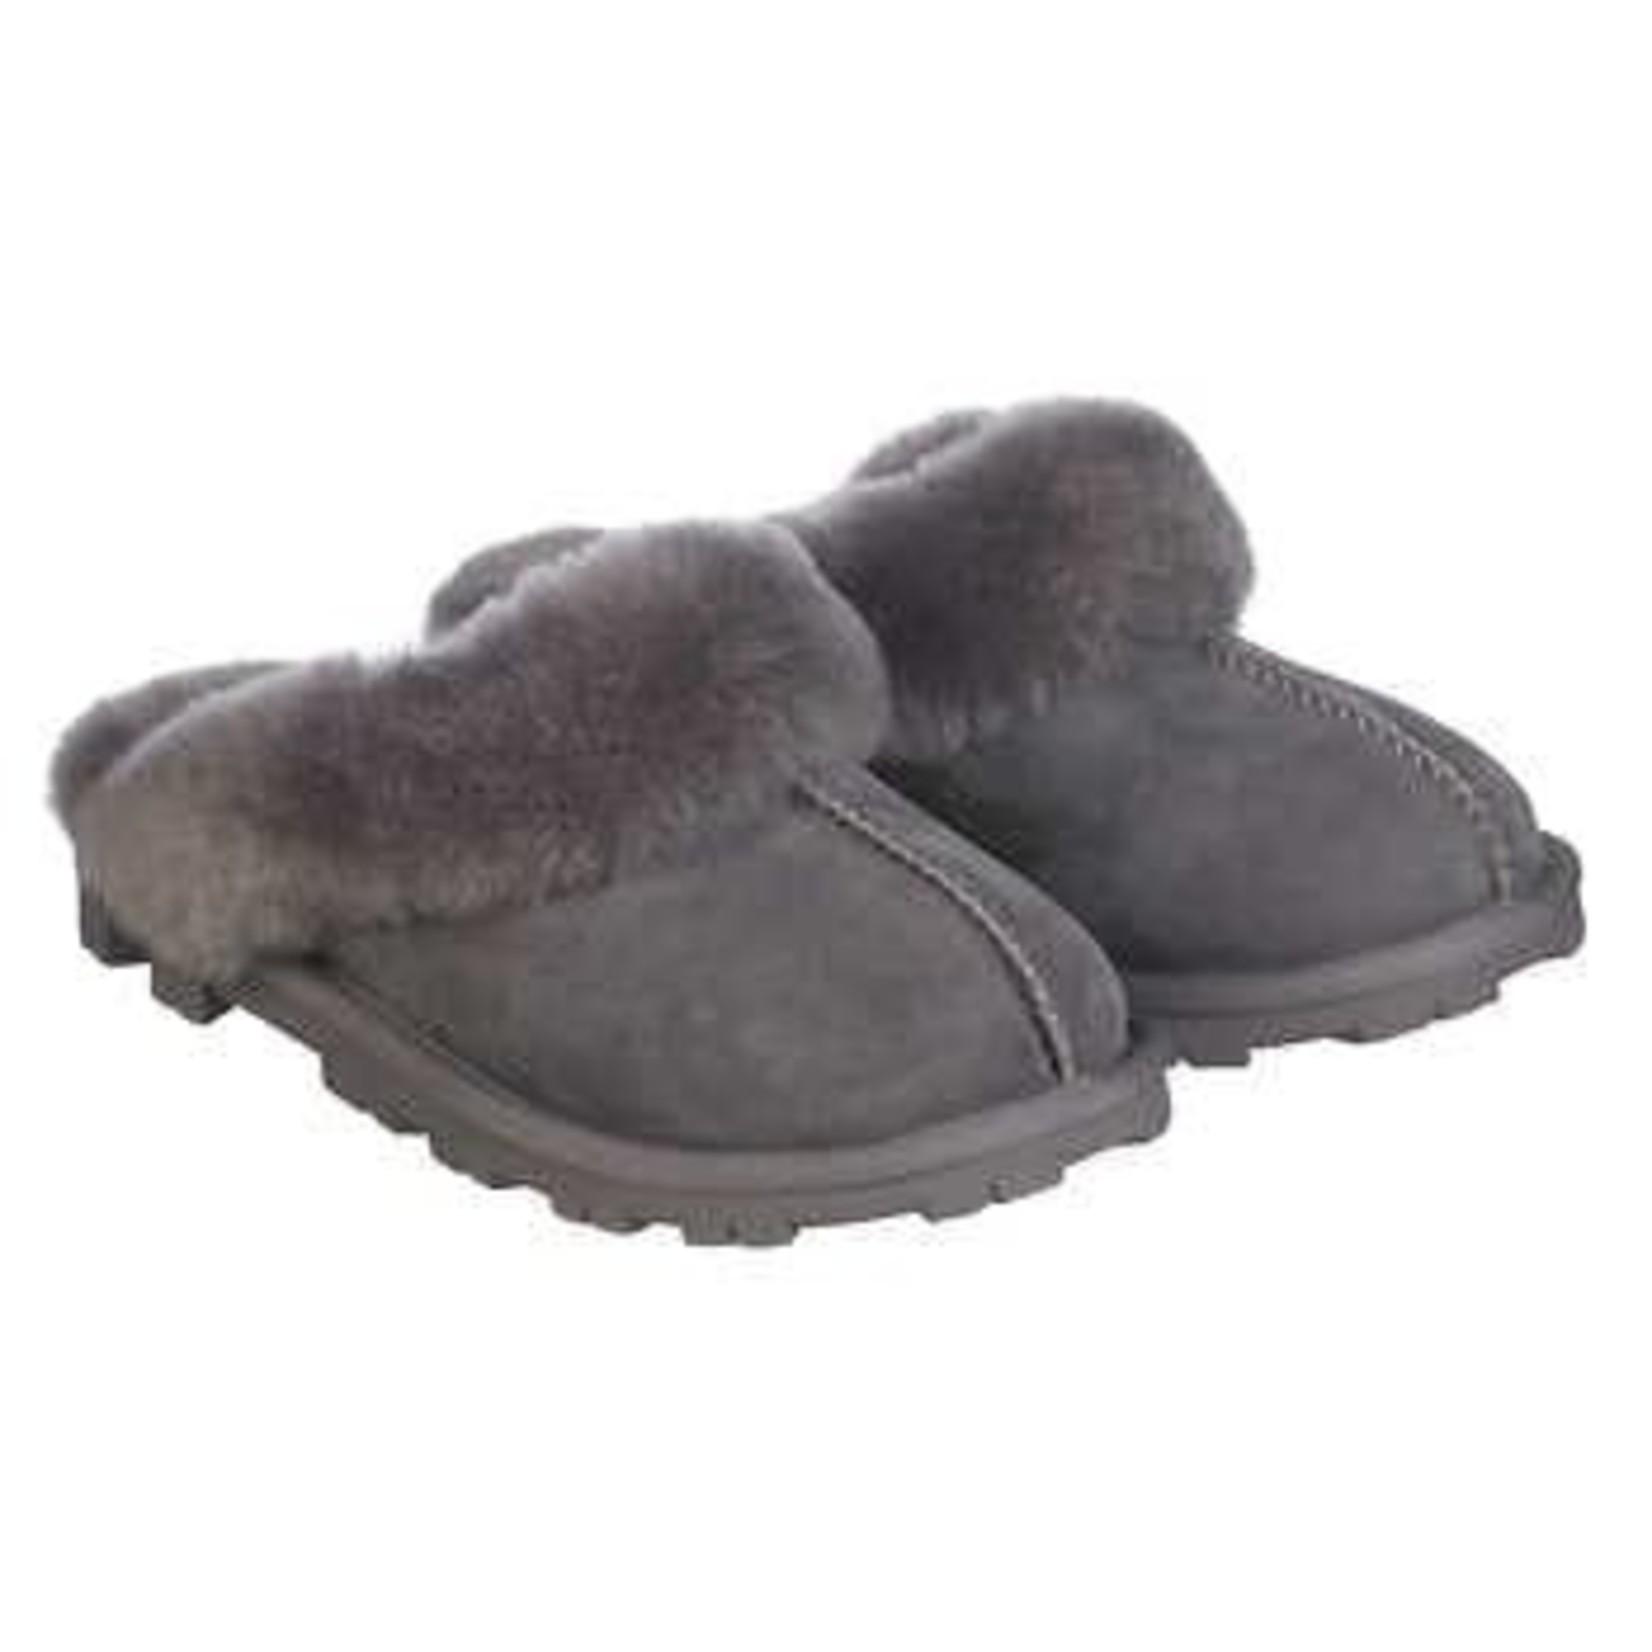 Kirkland Ladies Shearling Slipper Grey